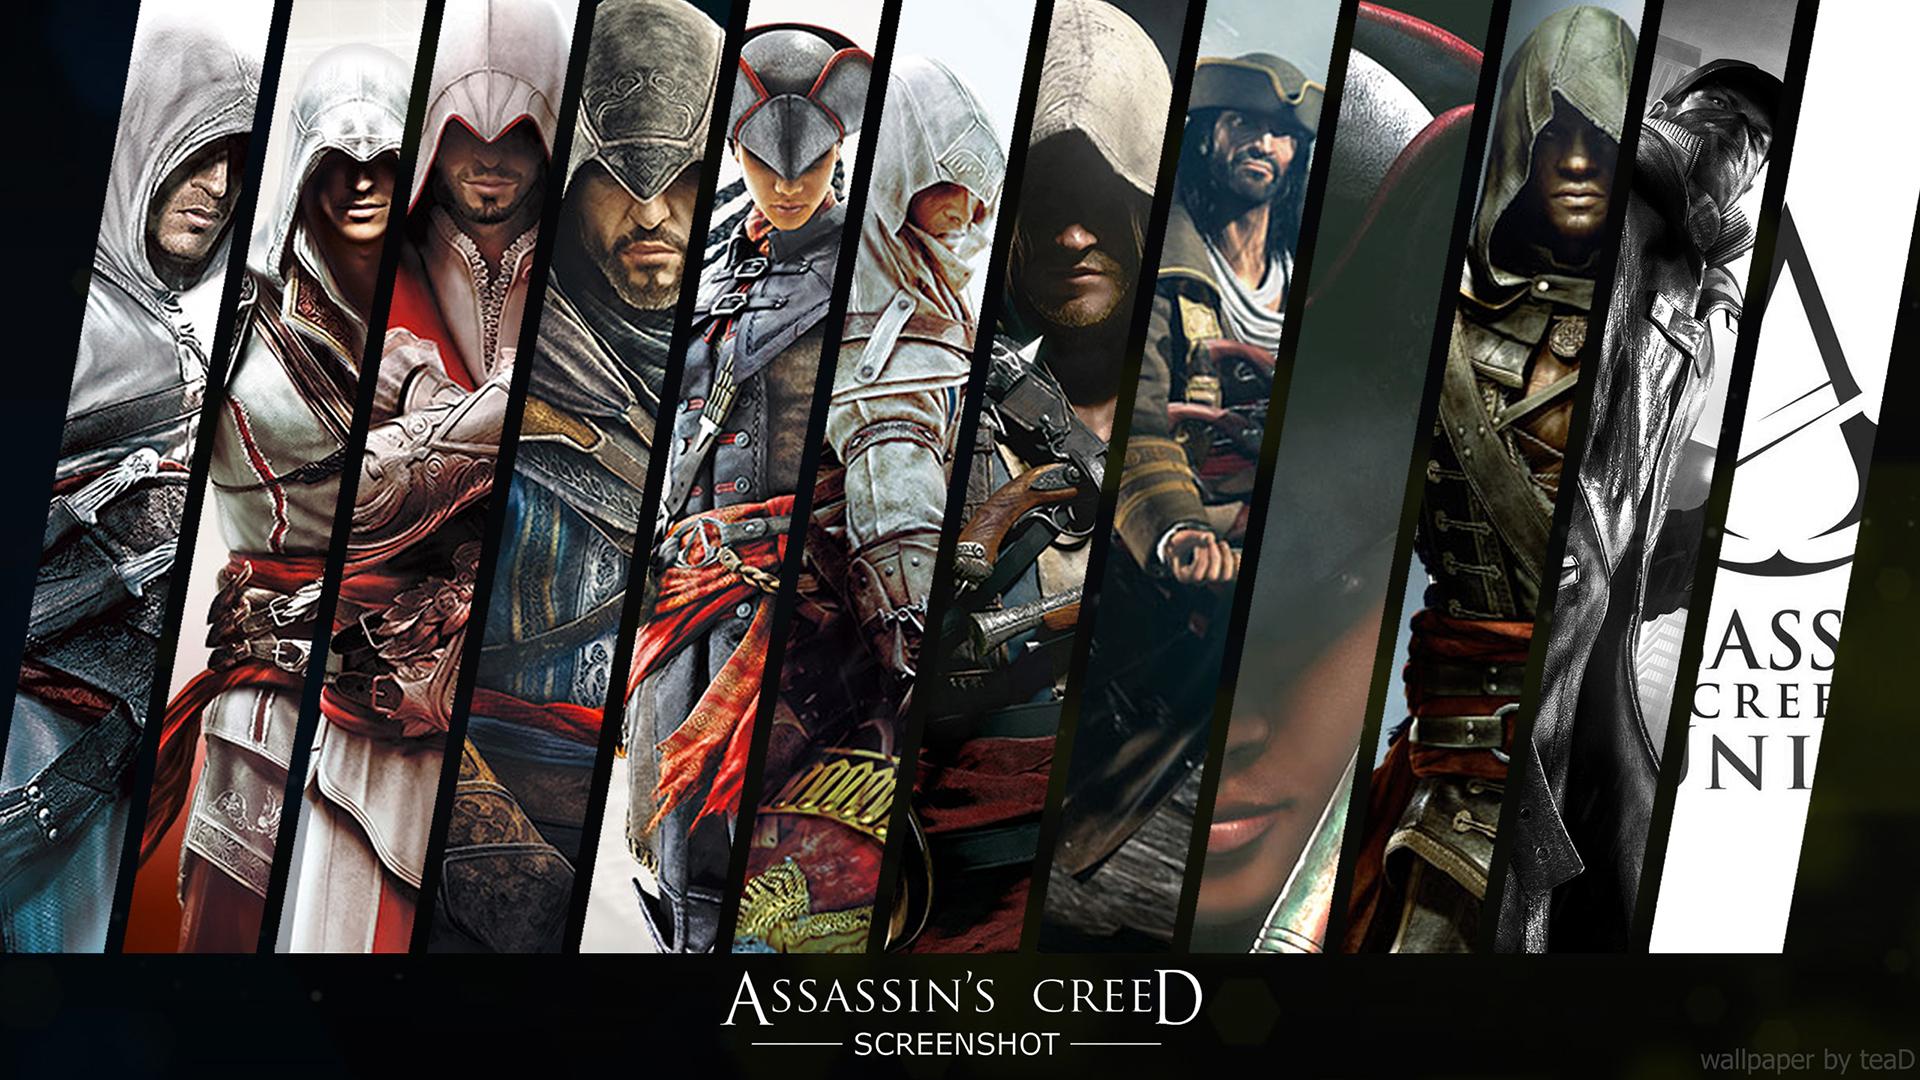 Assassin's Creed Unity Wallpaper - WallpaperSafari